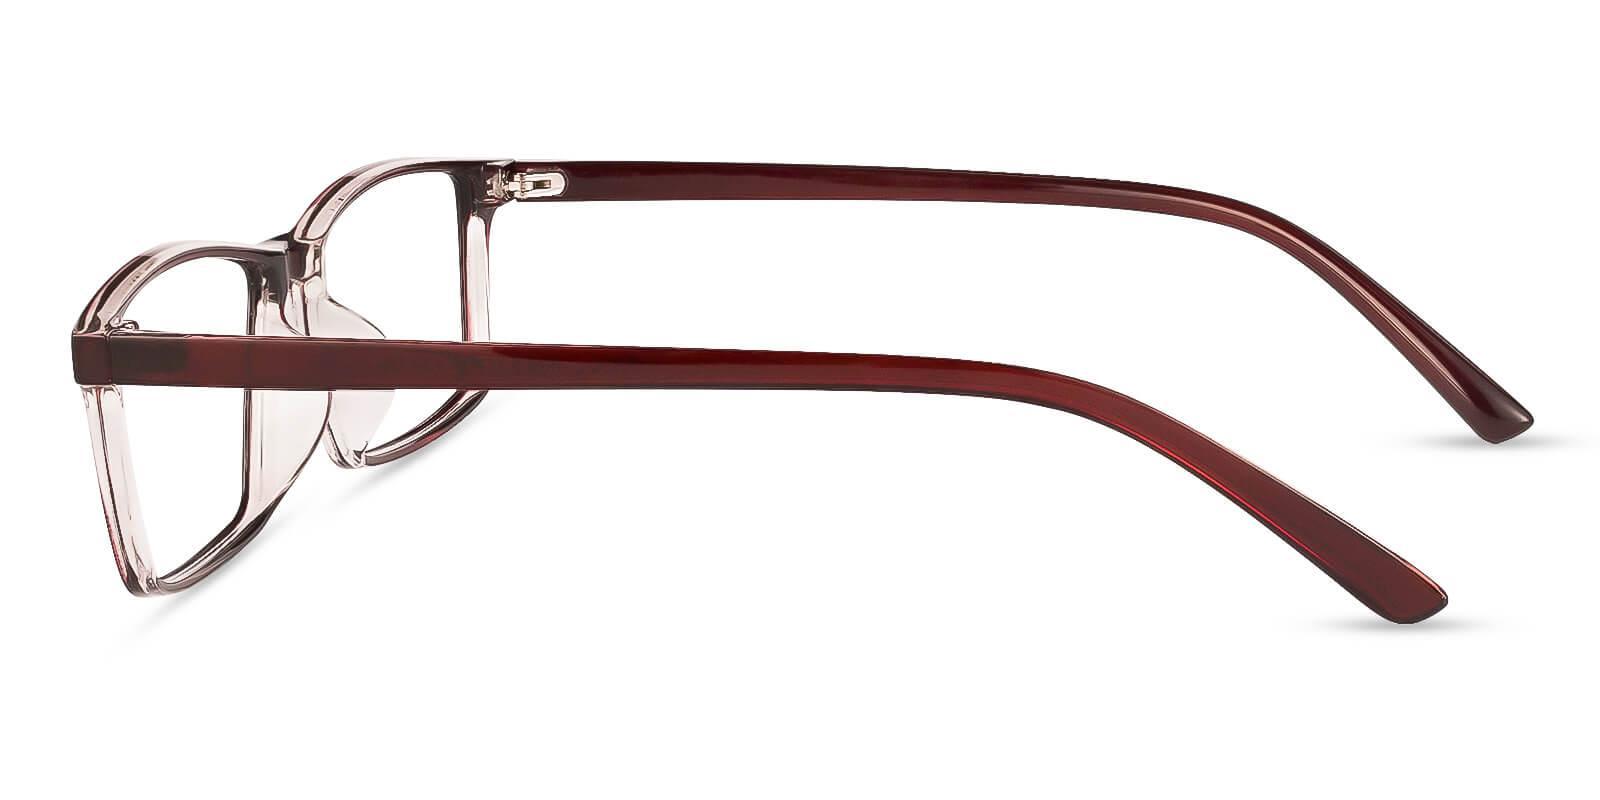 Eliana Red TR Eyeglasses , Lightweight , UniversalBridgeFit Frames from ABBE Glasses